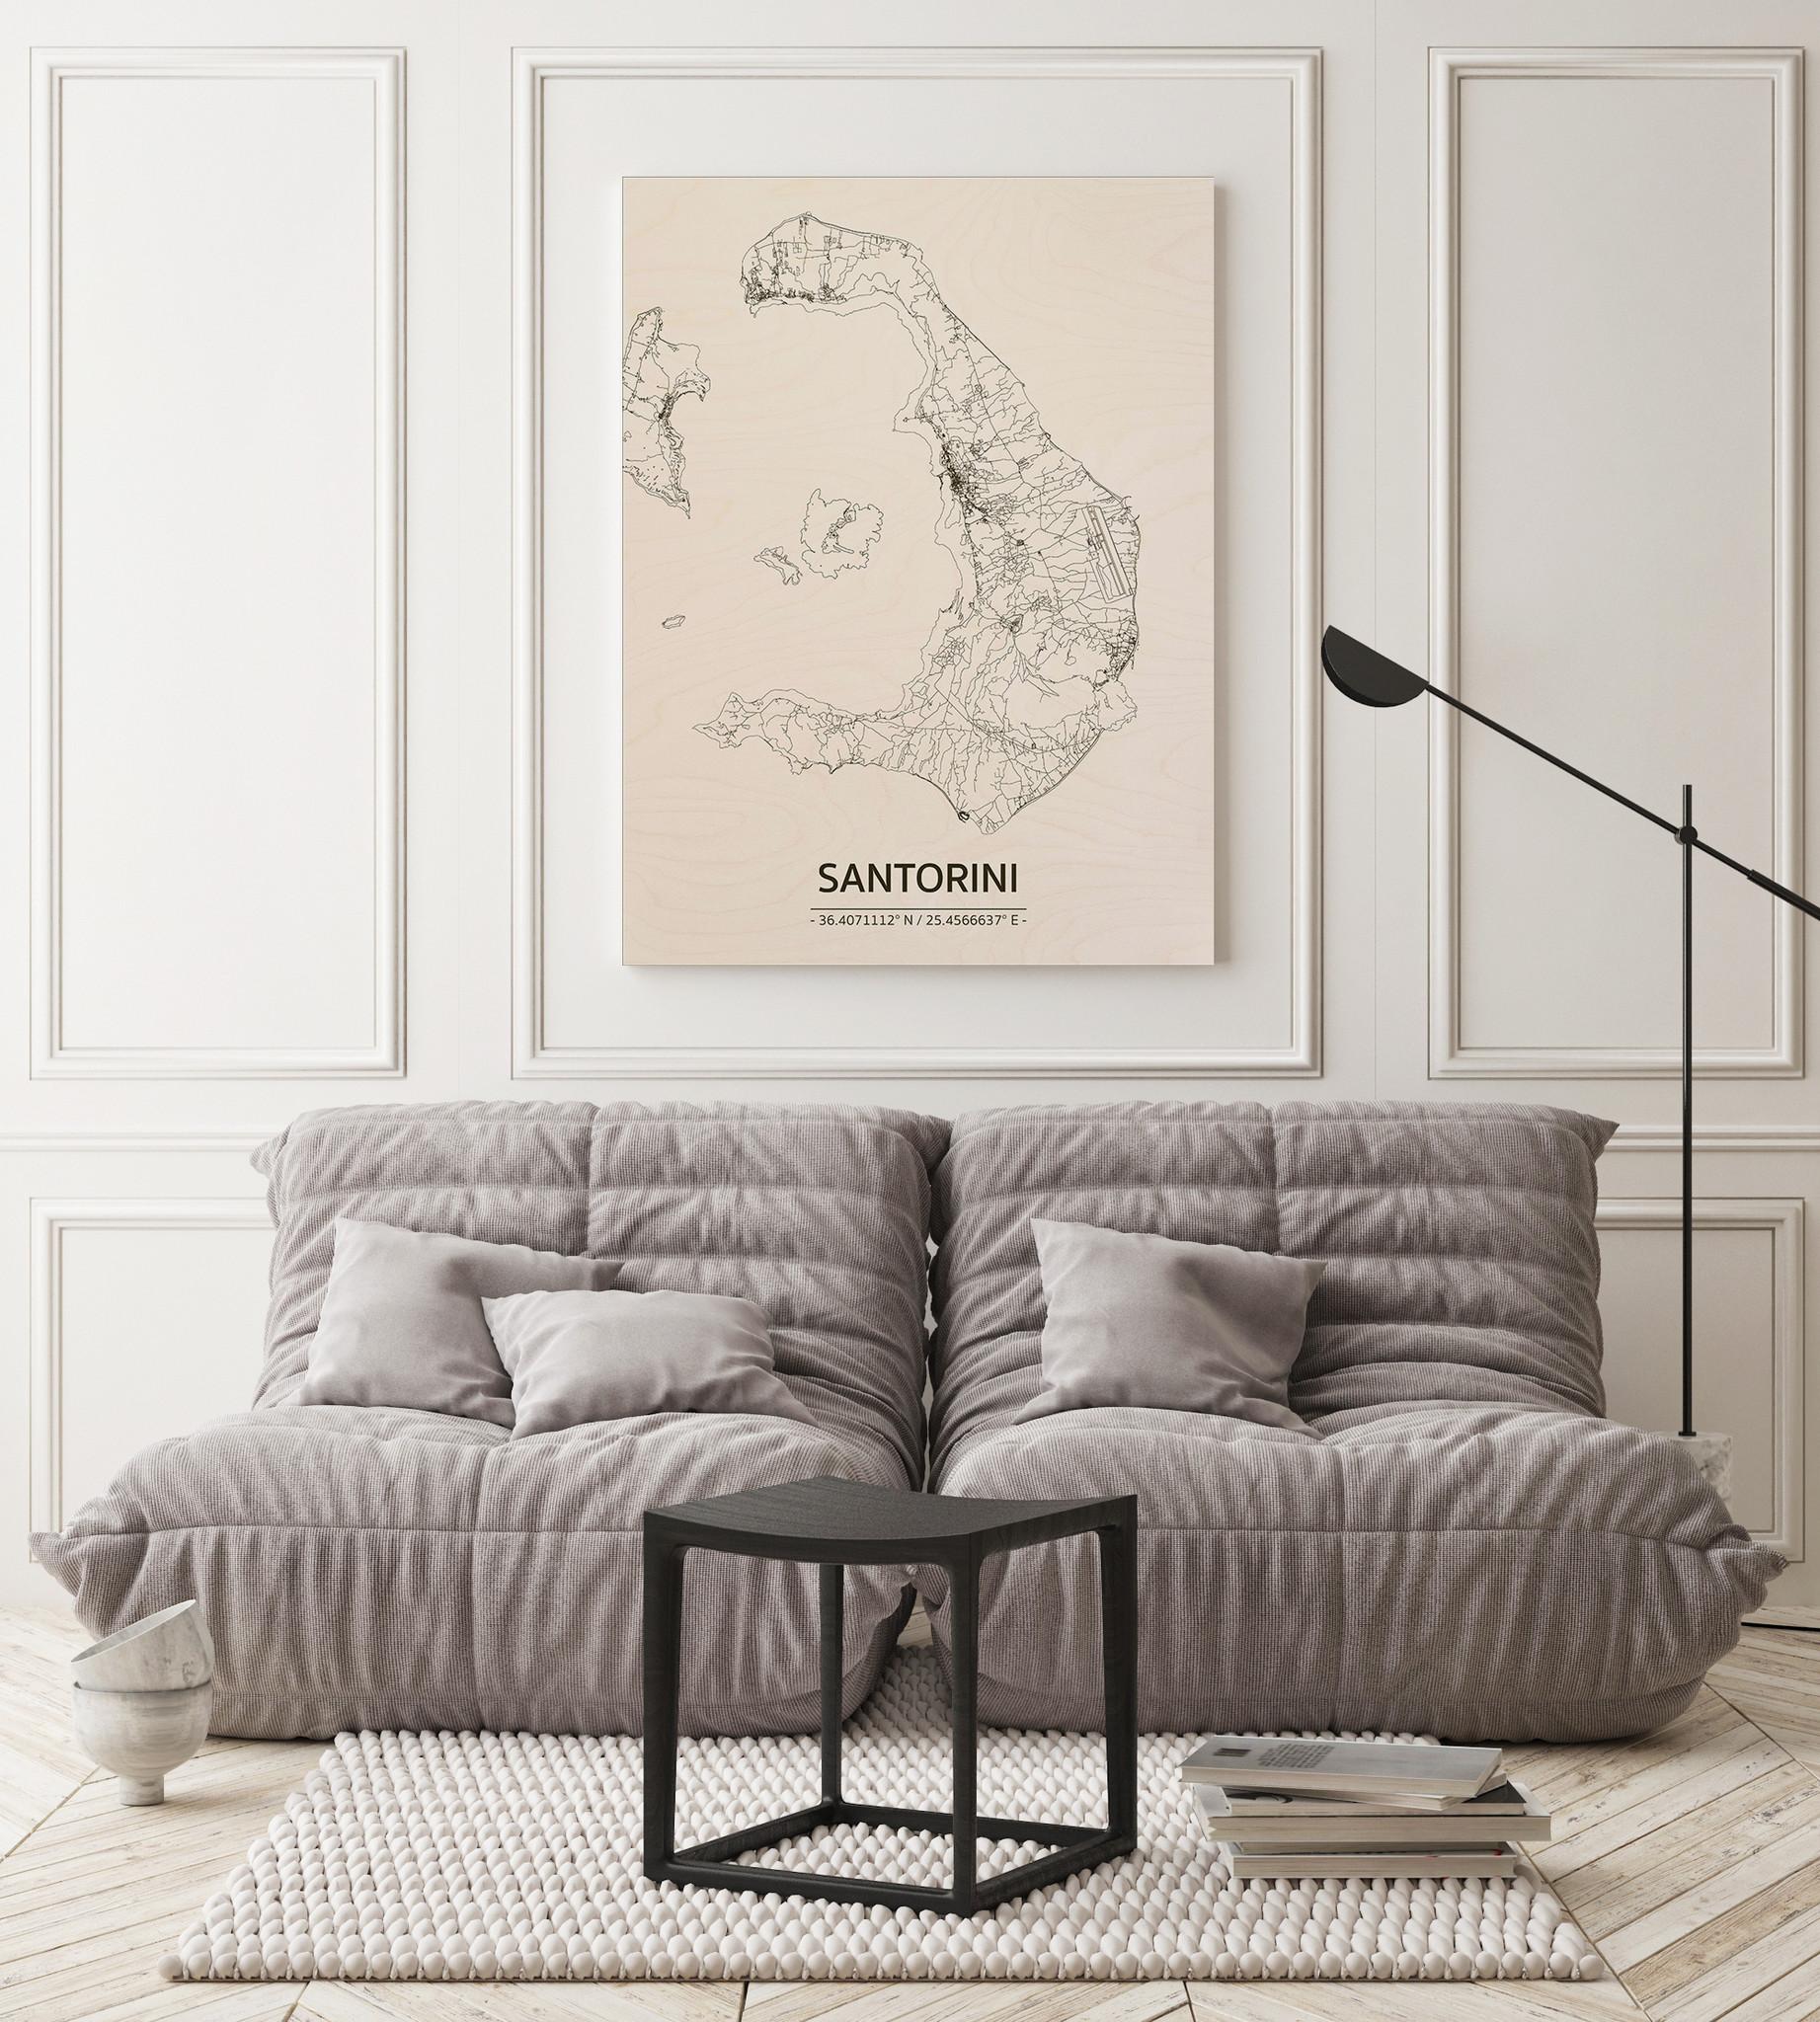 Stadtplan Santorini | Wanddekoration Holz-2